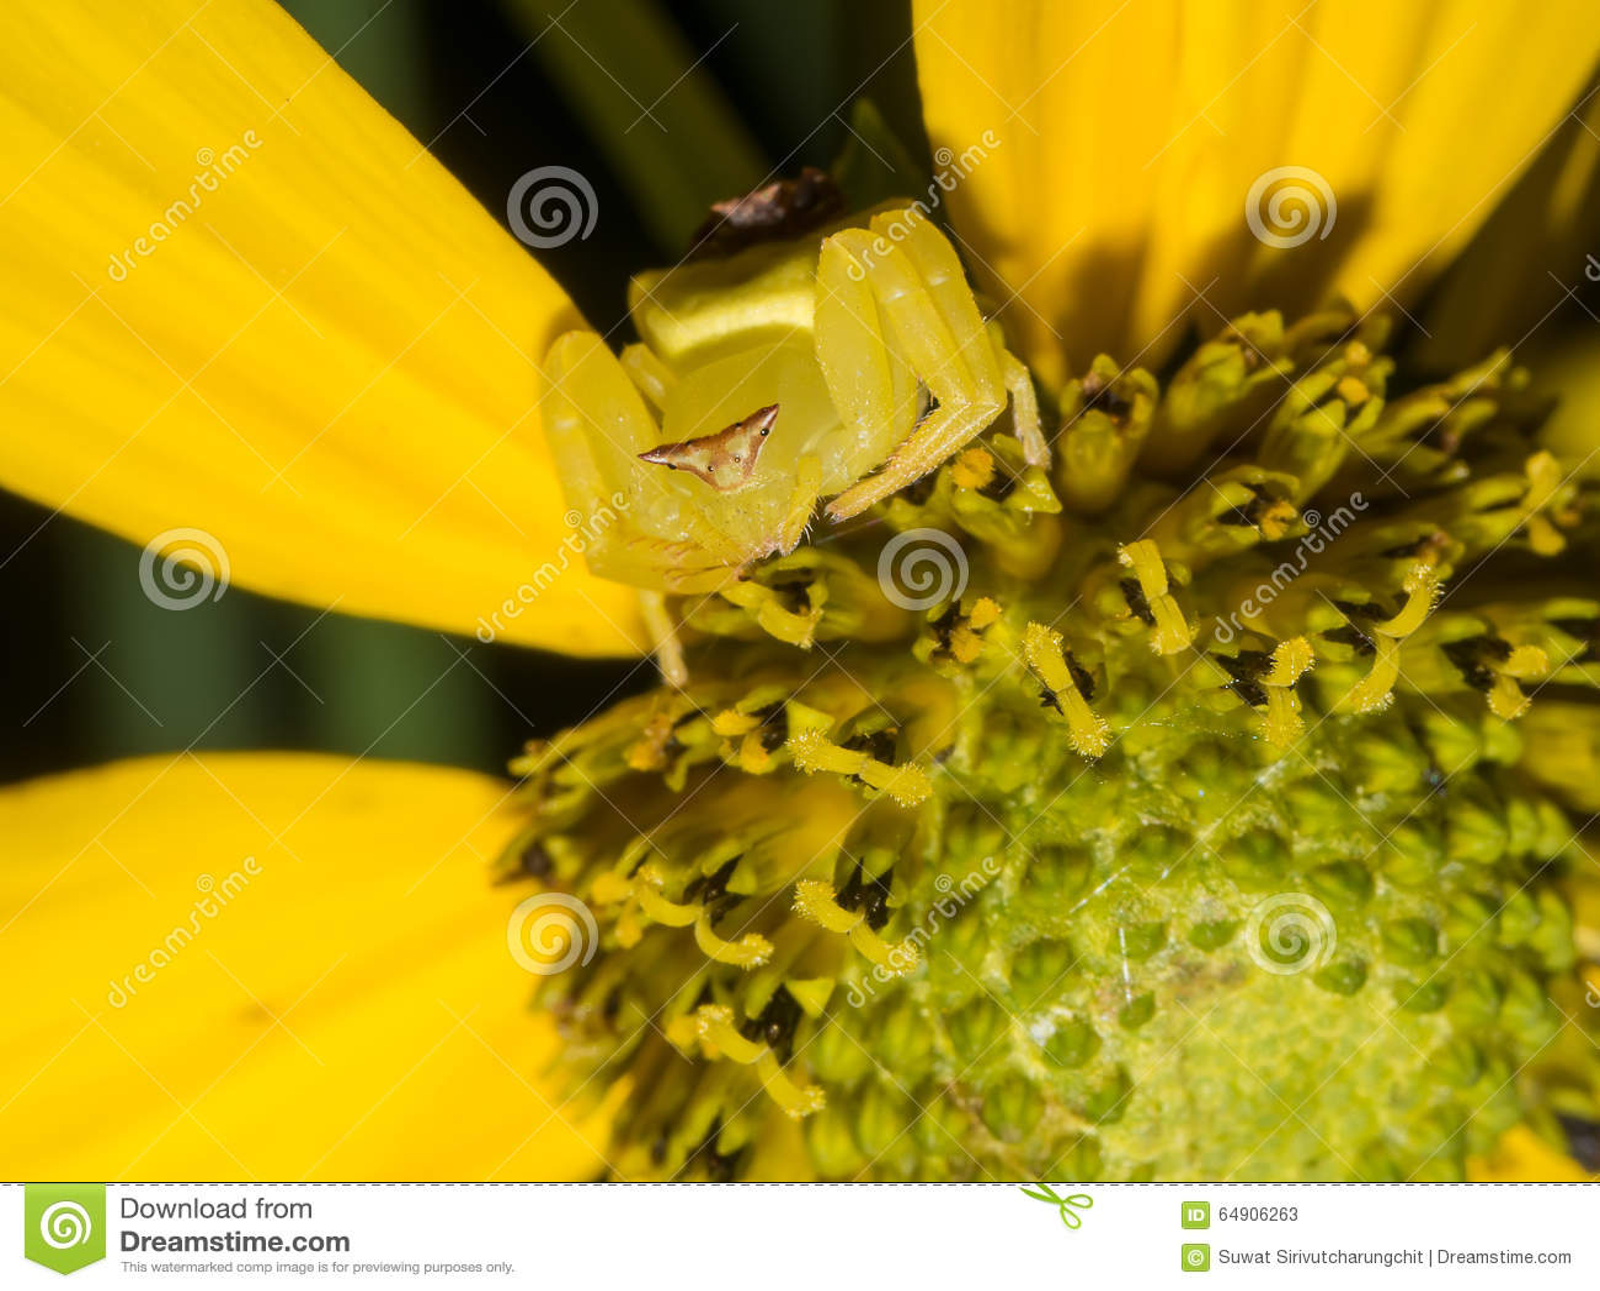 Yellow Spider Flower Stock Image Image Of Garden Life 64906263